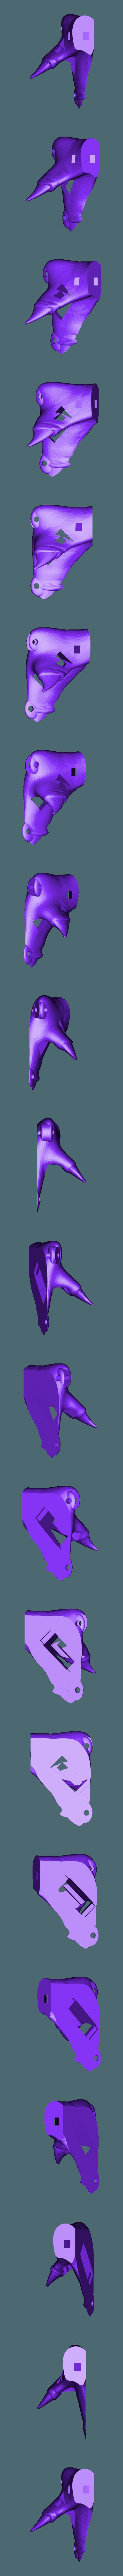 GADGETS feet pt2 2 print .stl Download free STL file GADGET the robotic Gremlin • 3D printing object, atarka3